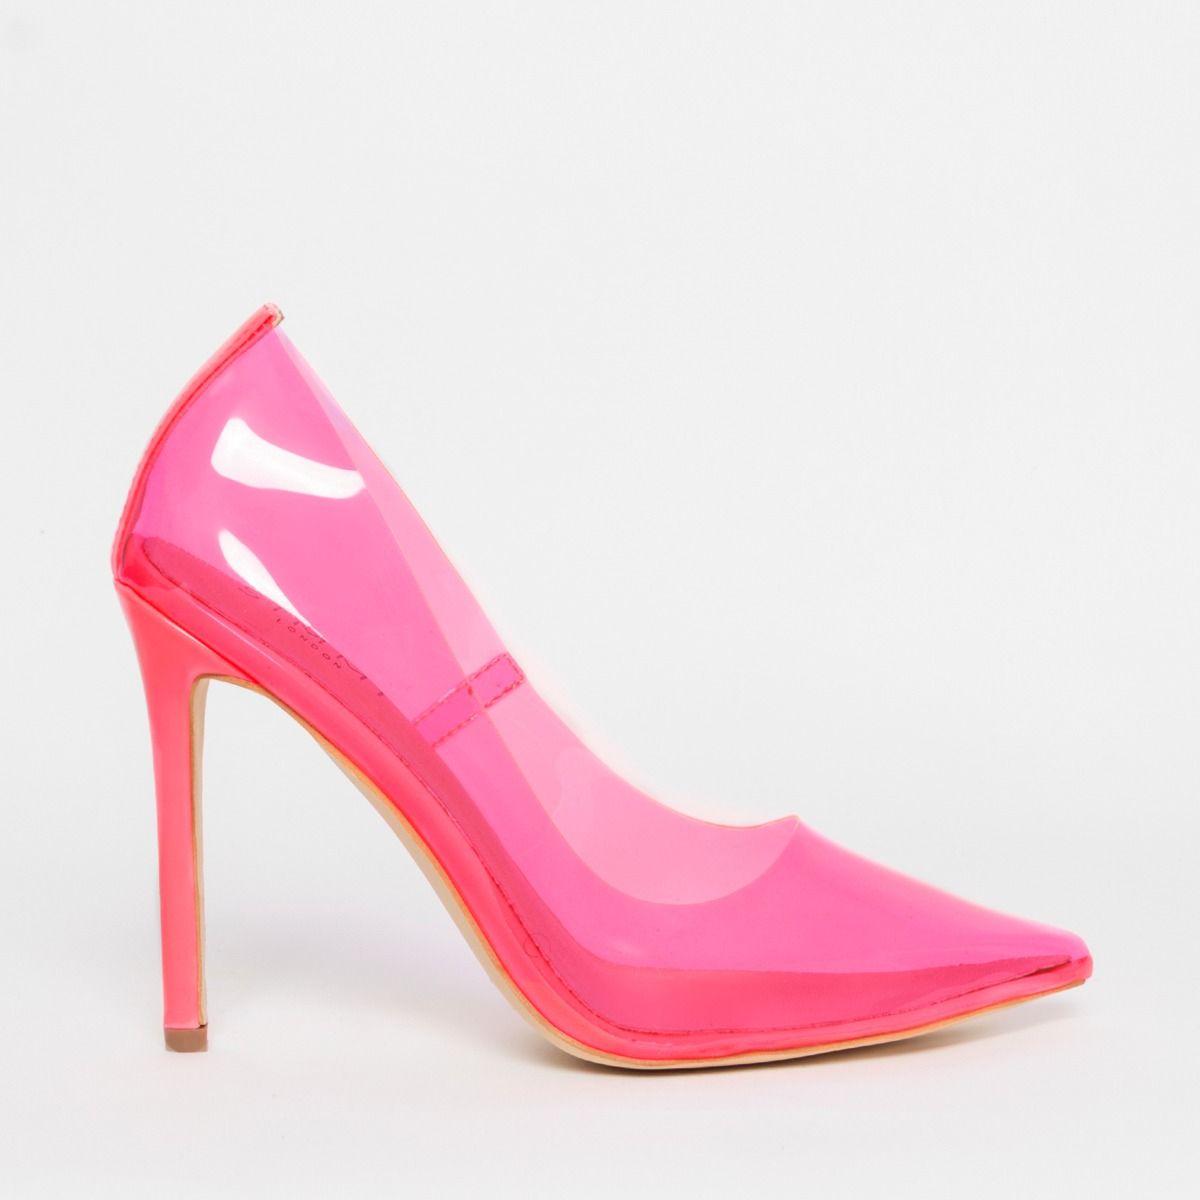 Nova Neon Pink Clear Stiletto Court Shoes